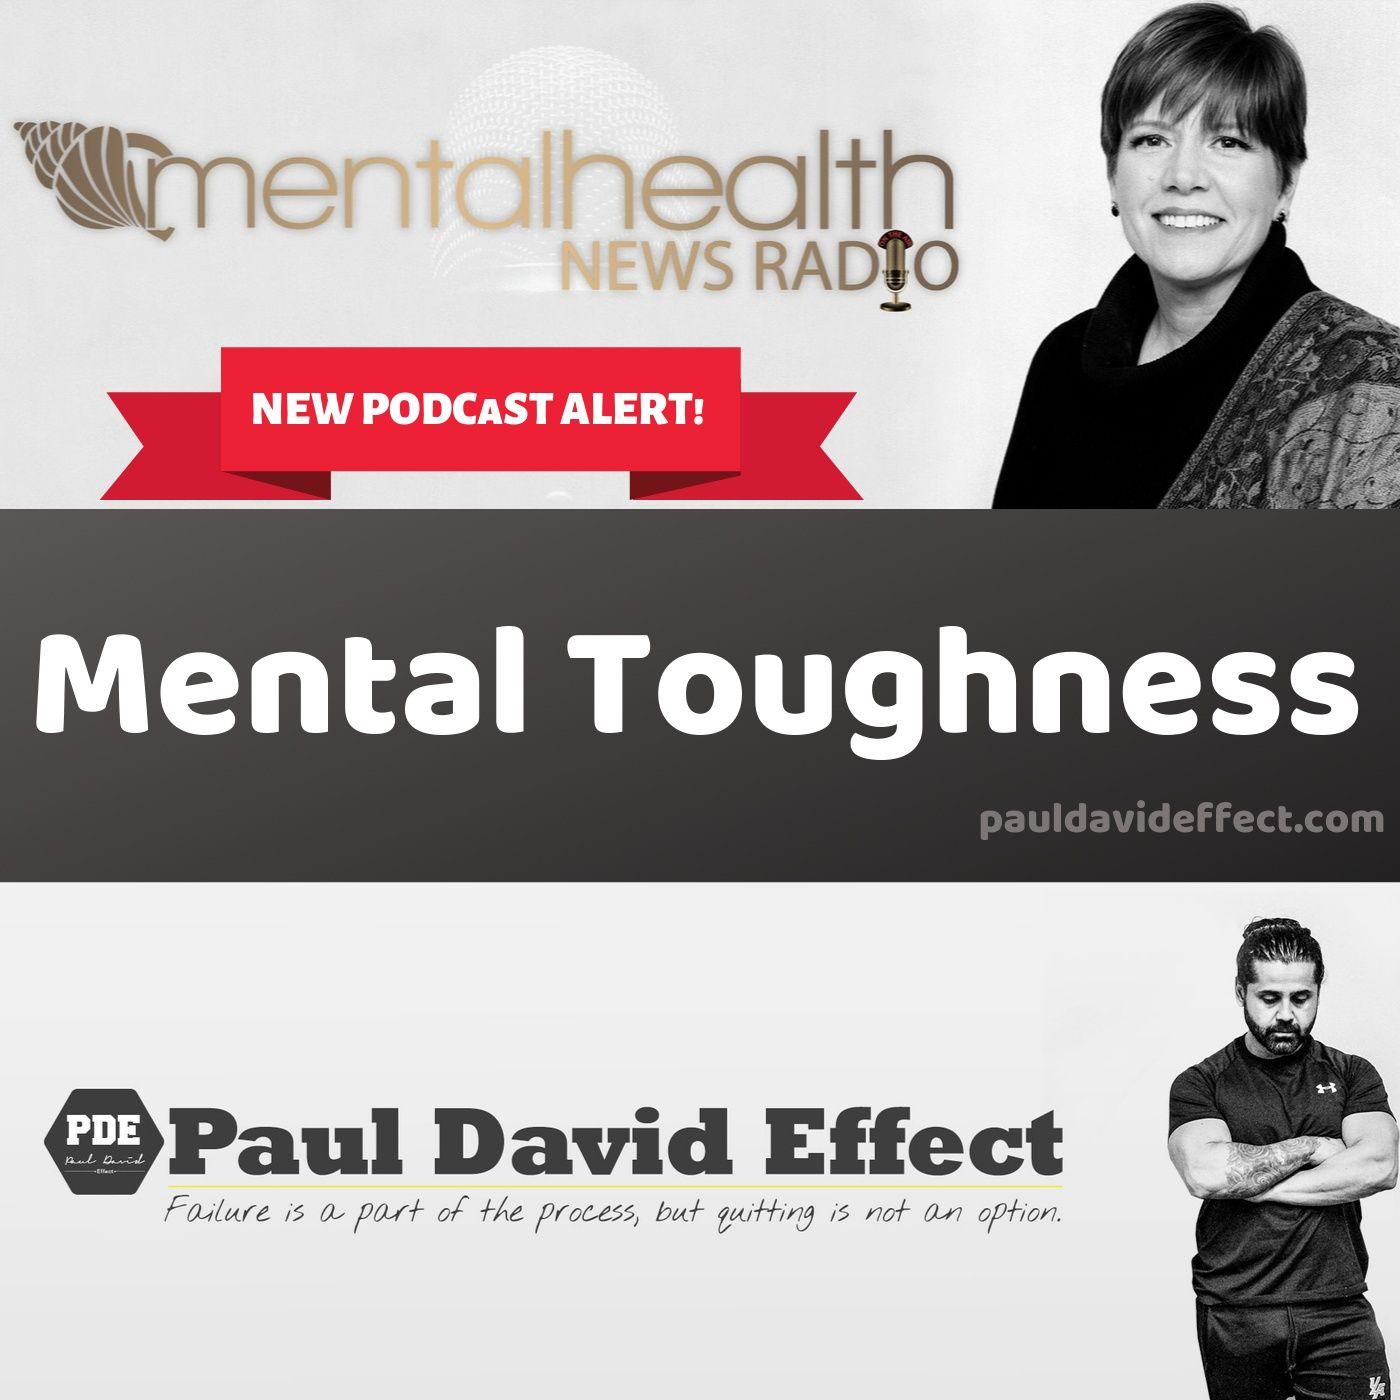 Mental Health News Radio - Mental Toughness with Paul David